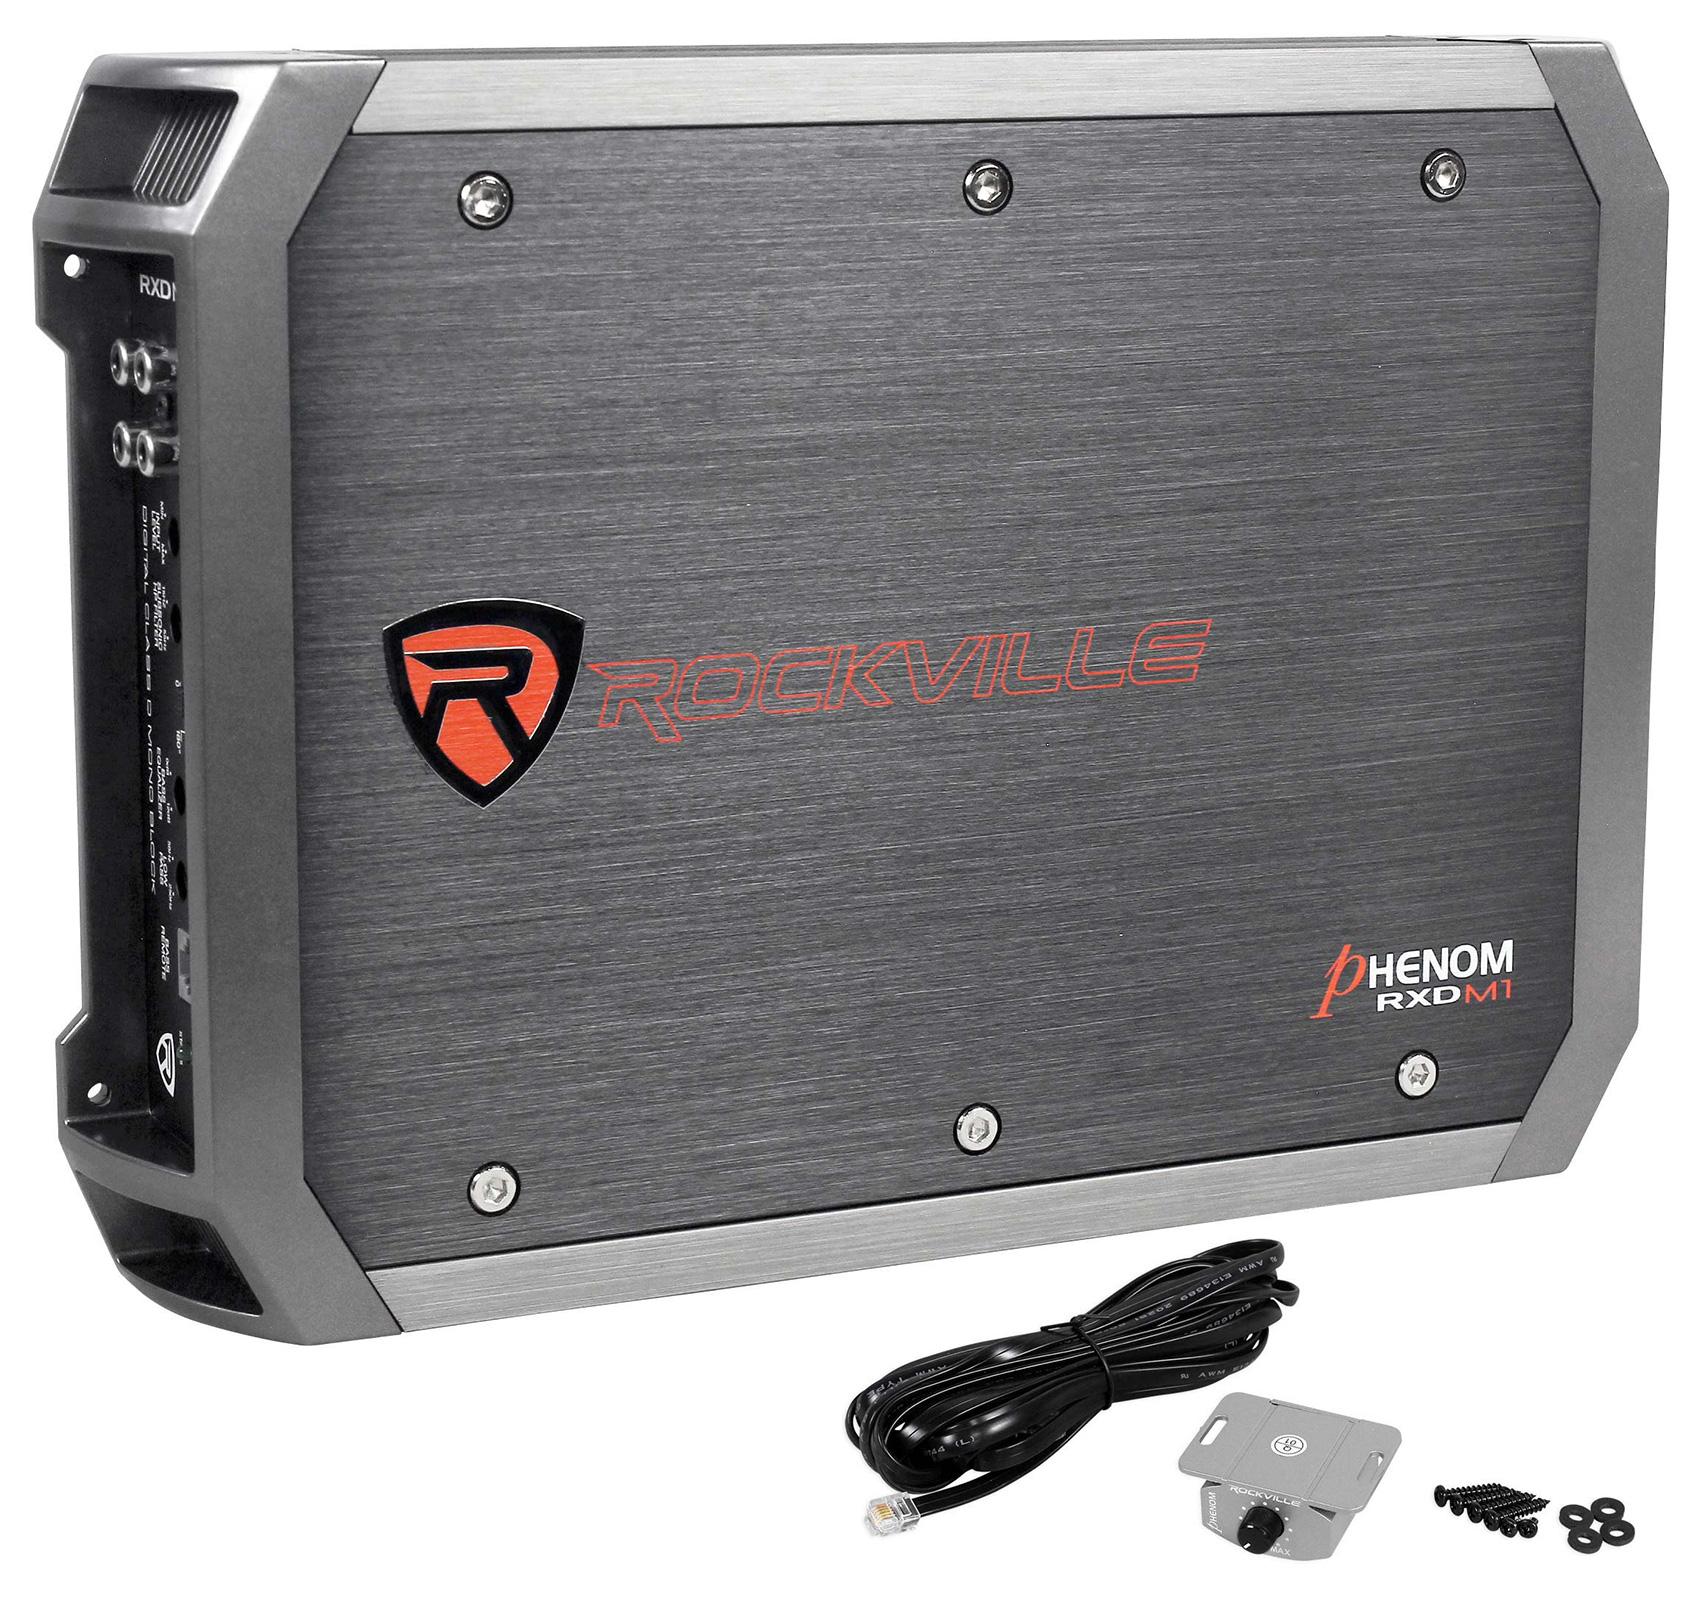 "Rockville 1000w Mono Amplifier Amp For (2) Kicker 44CWCD104 CompC 10"" Subwoofers"